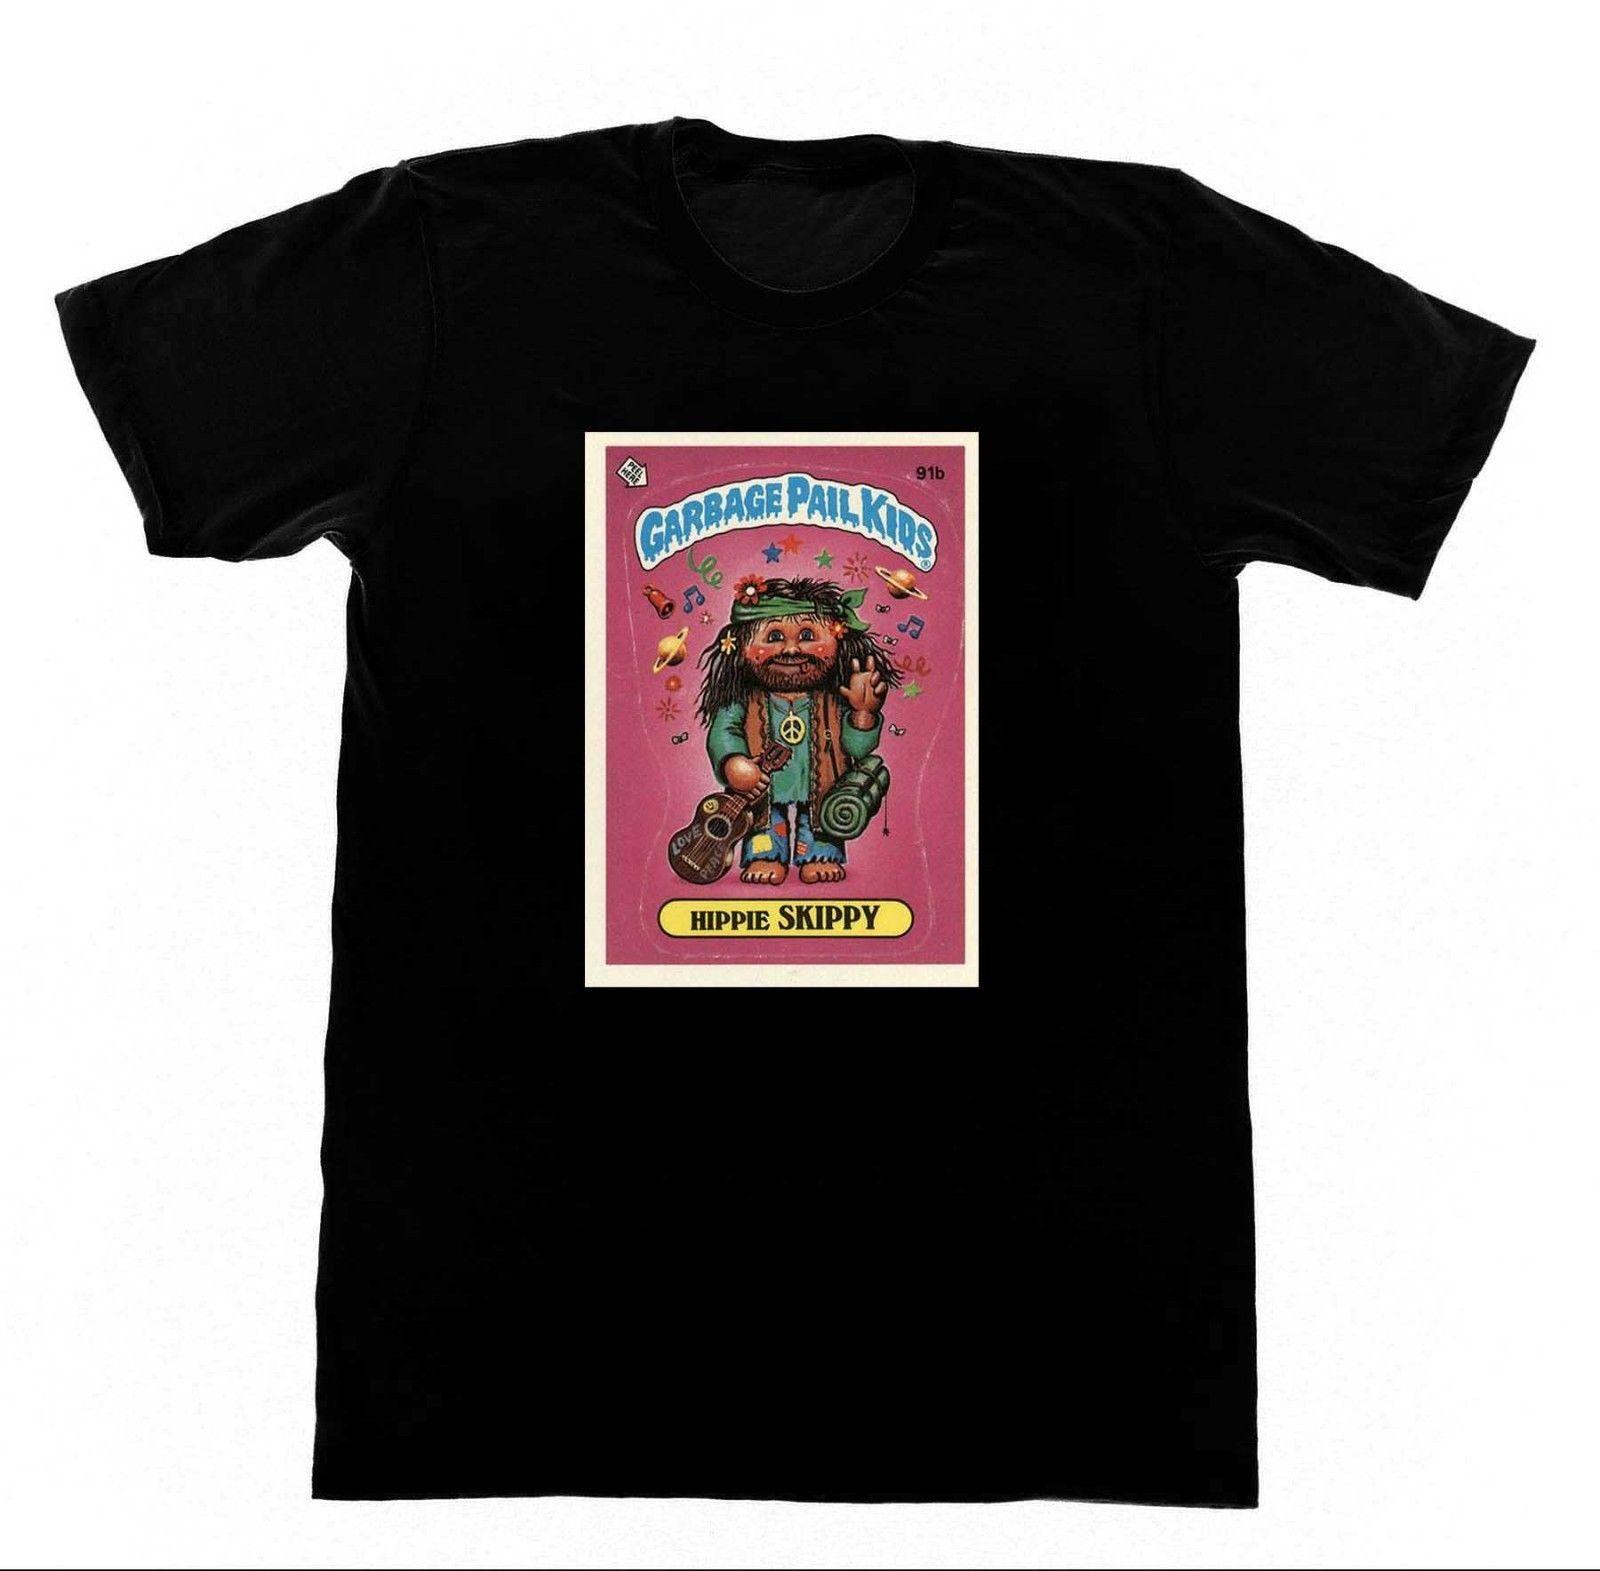 Garbage Pail Kids Hippy Skippy - Shirt 11 Tshirt Widespread Panic Phish Dead